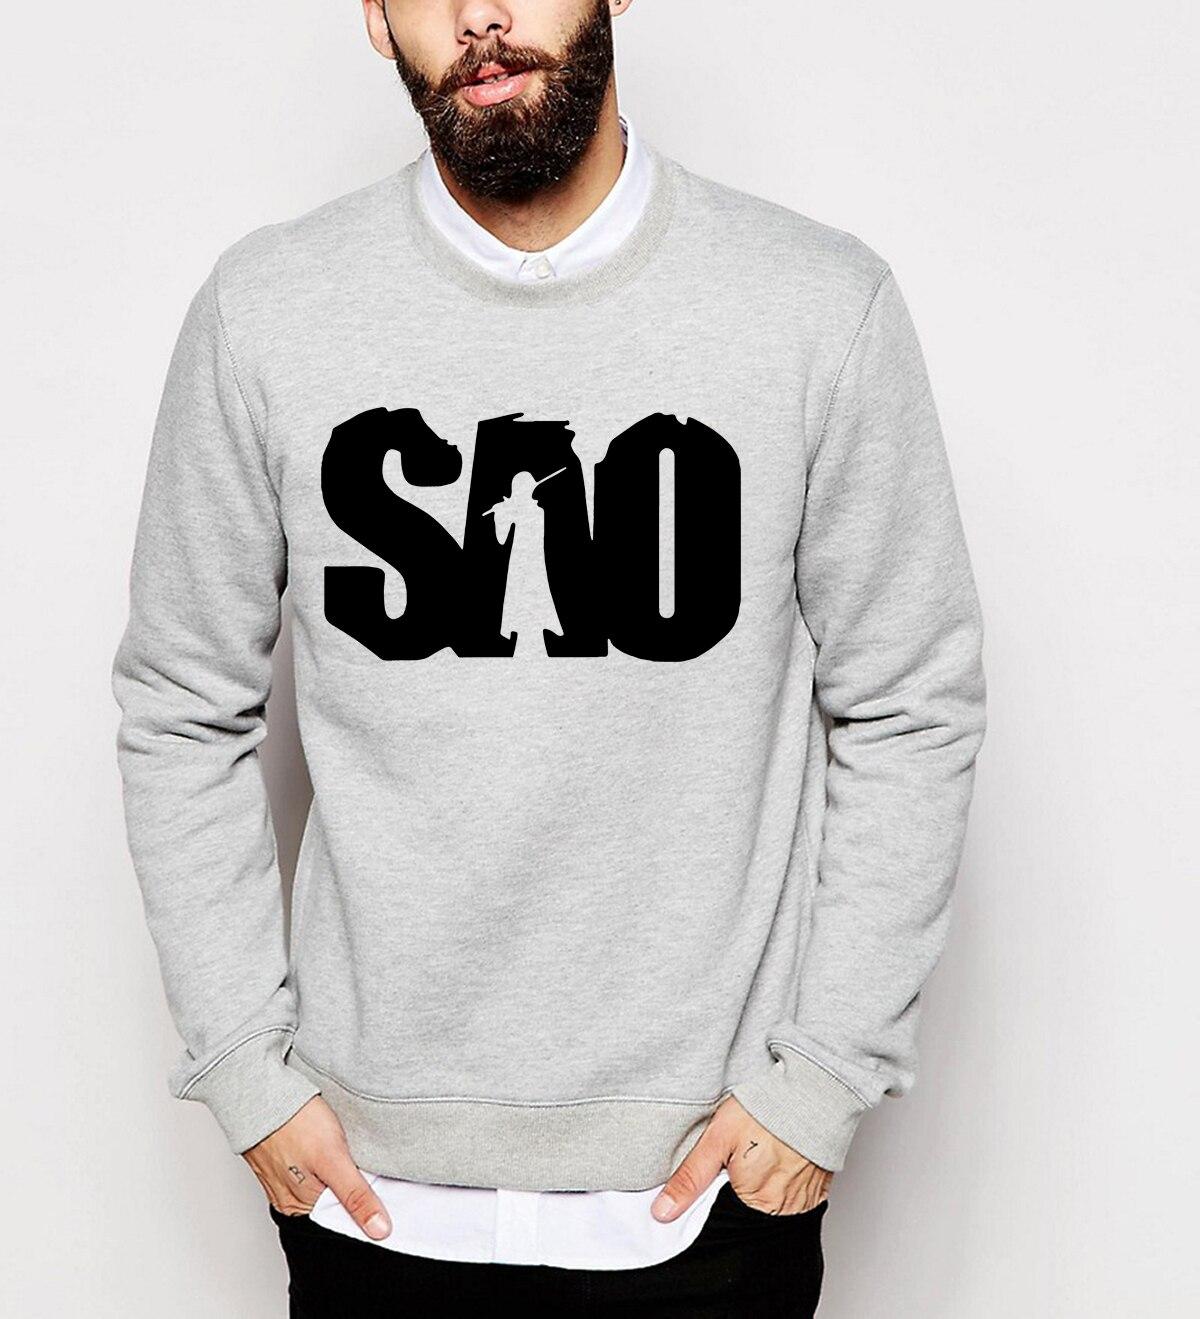 2019 hipster hoodies  hot sale black top print sweatshirts men  fall winter brand hip hop tracksuits streetwear